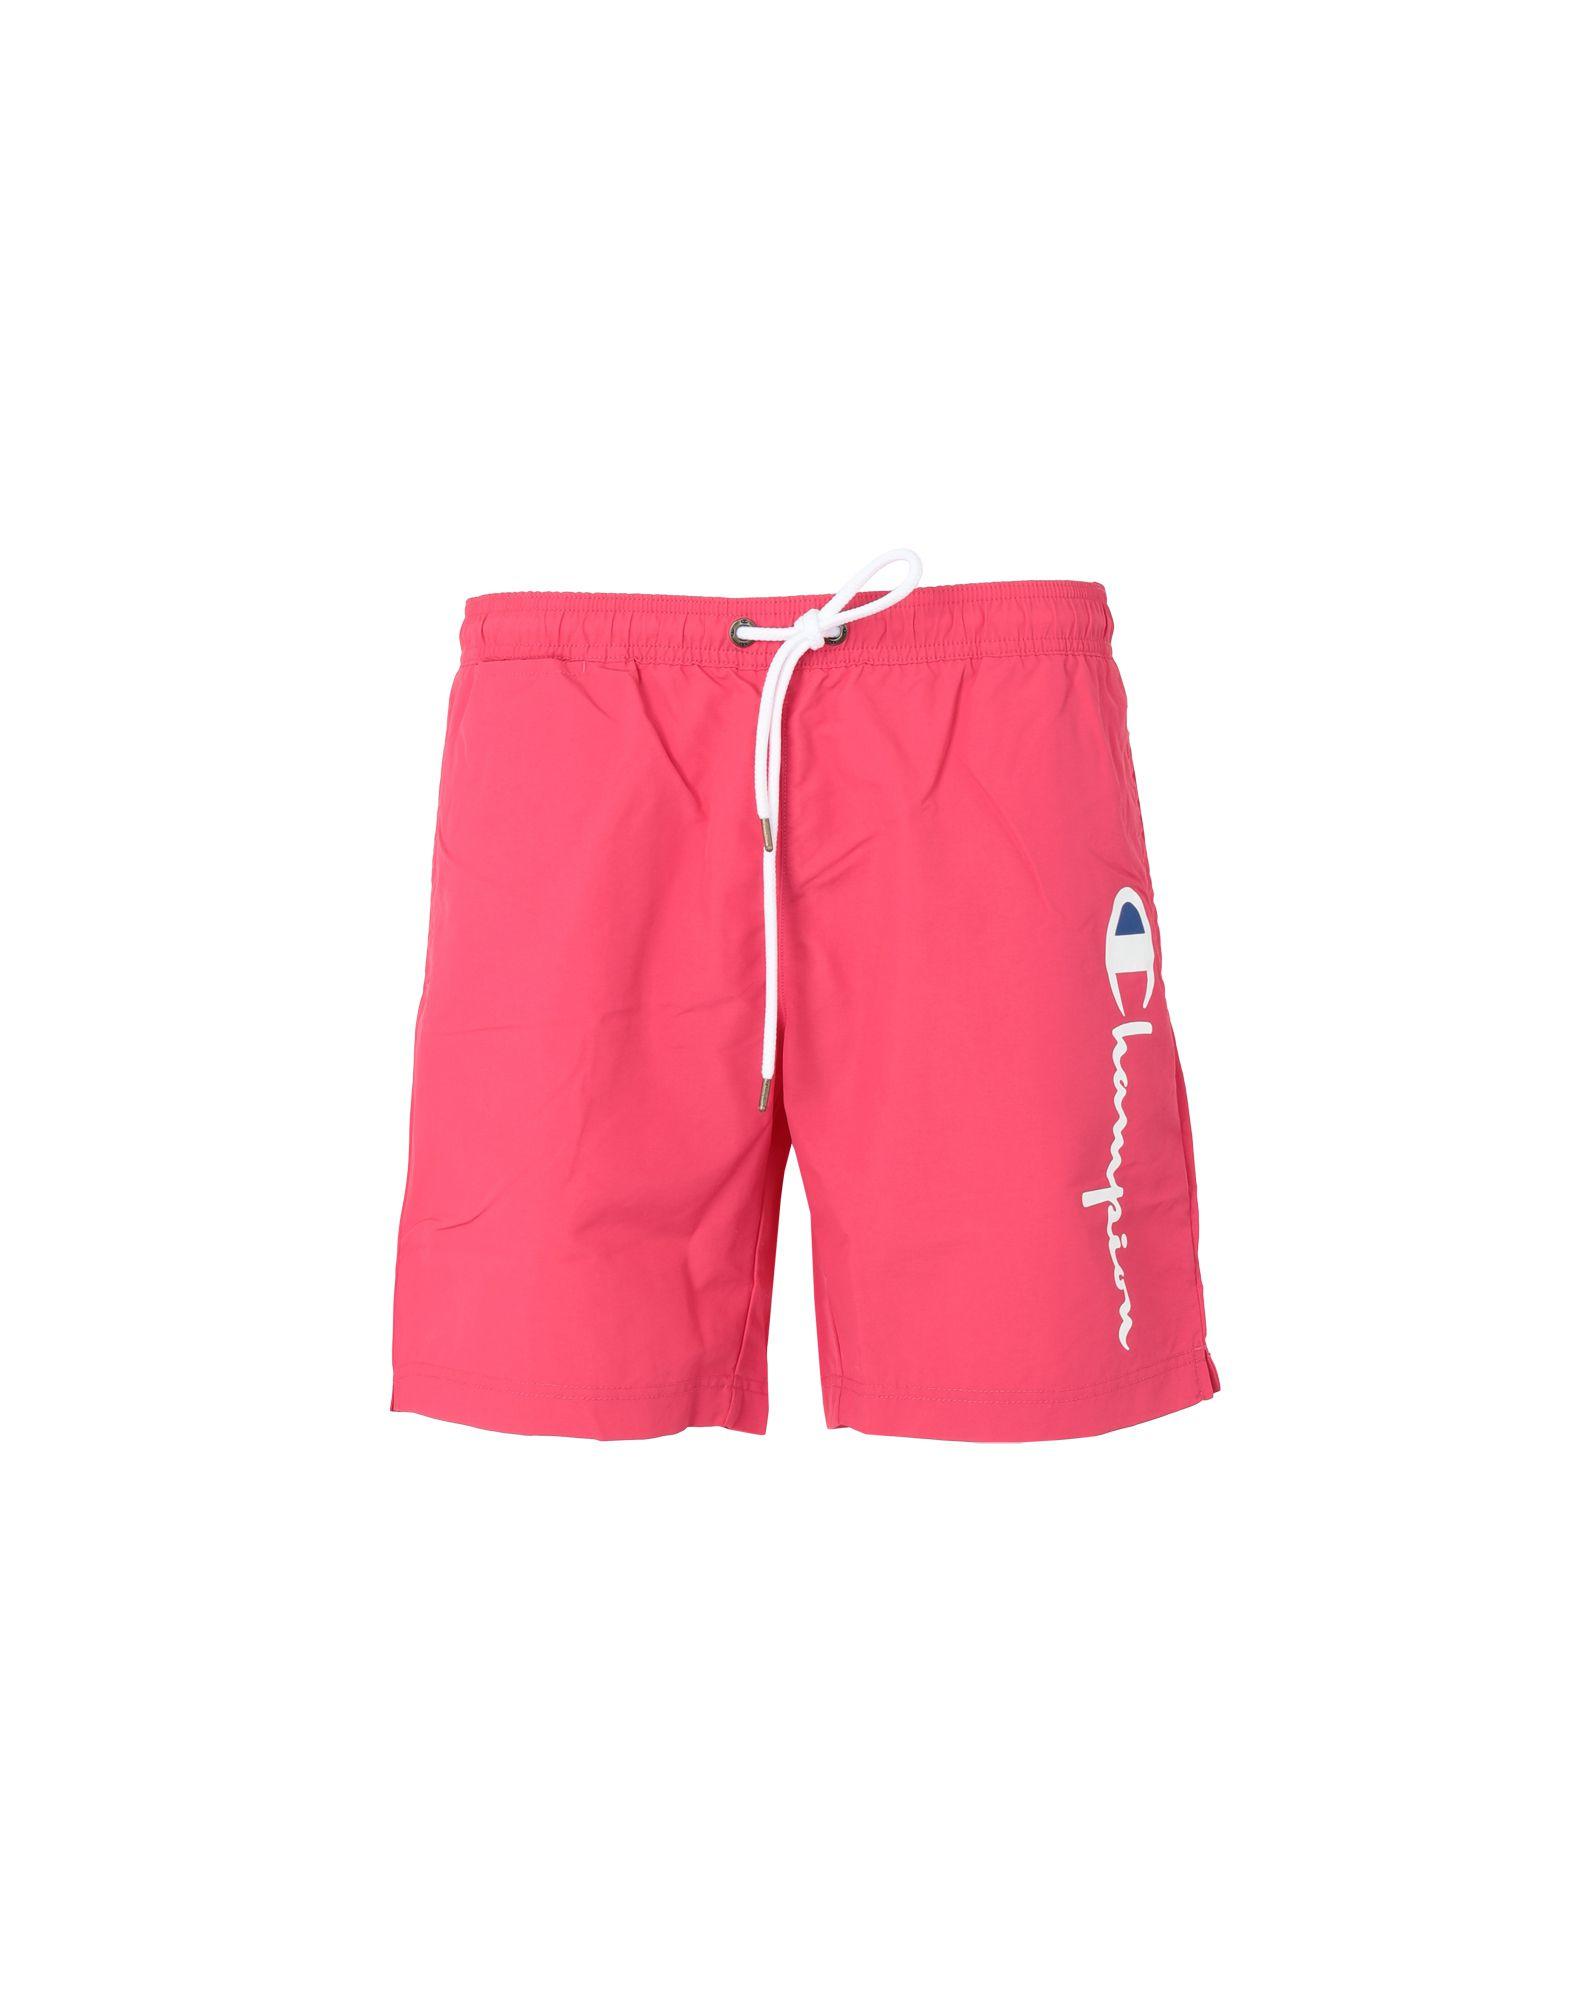 CHAMPION REVERSE WEAVE Шорты для плавания шапочка для плавания mad wave reverse champion цвет розовый фиолетовый